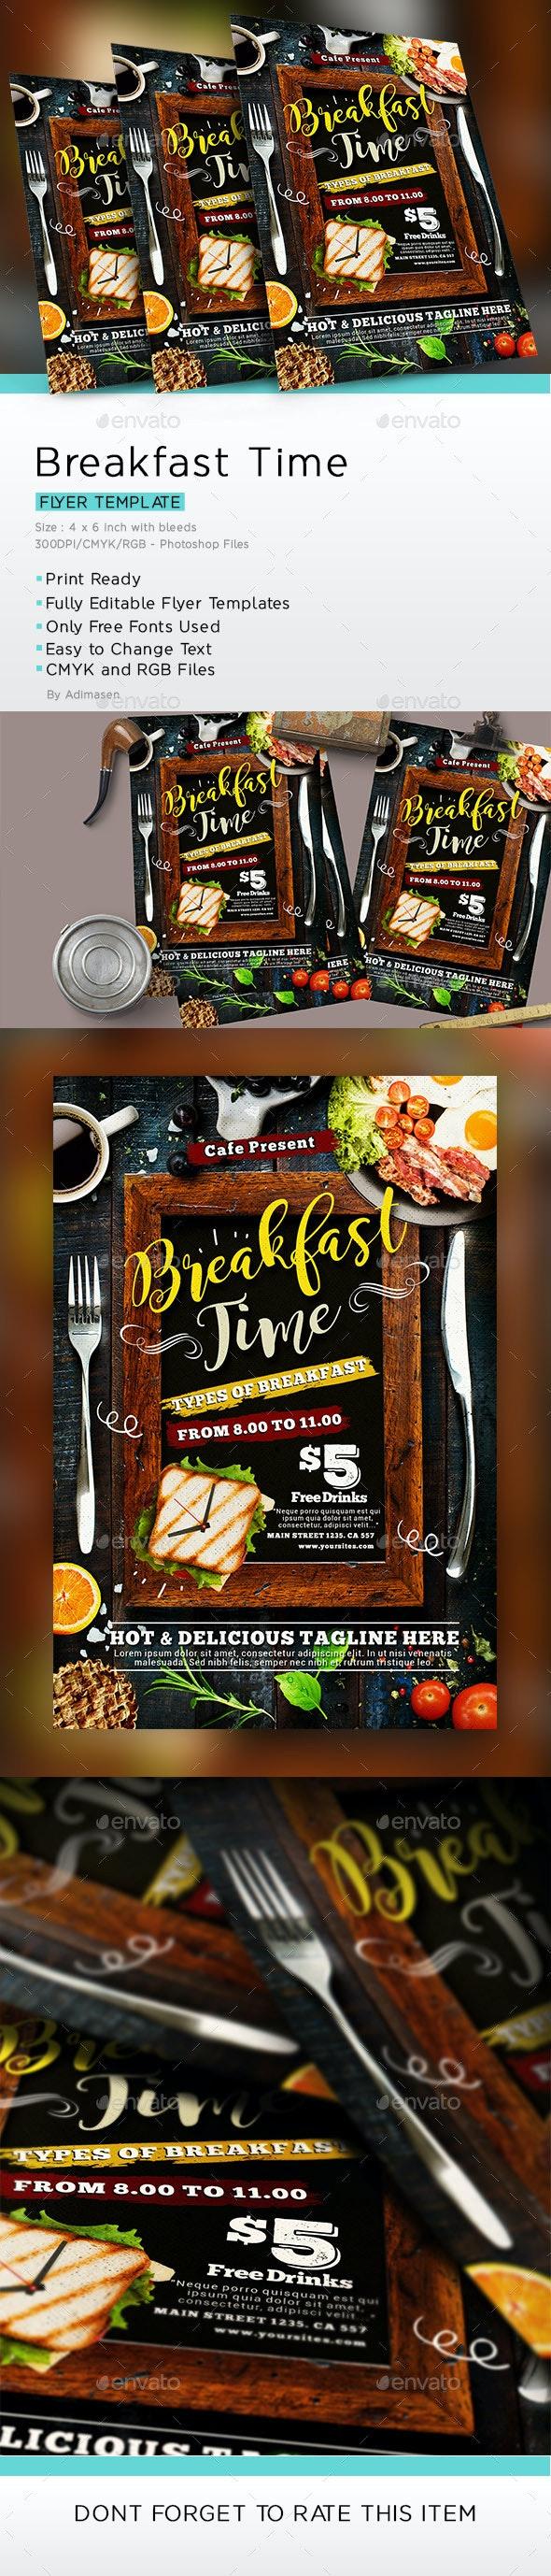 Breakfast Flyer - Restaurant Flyers